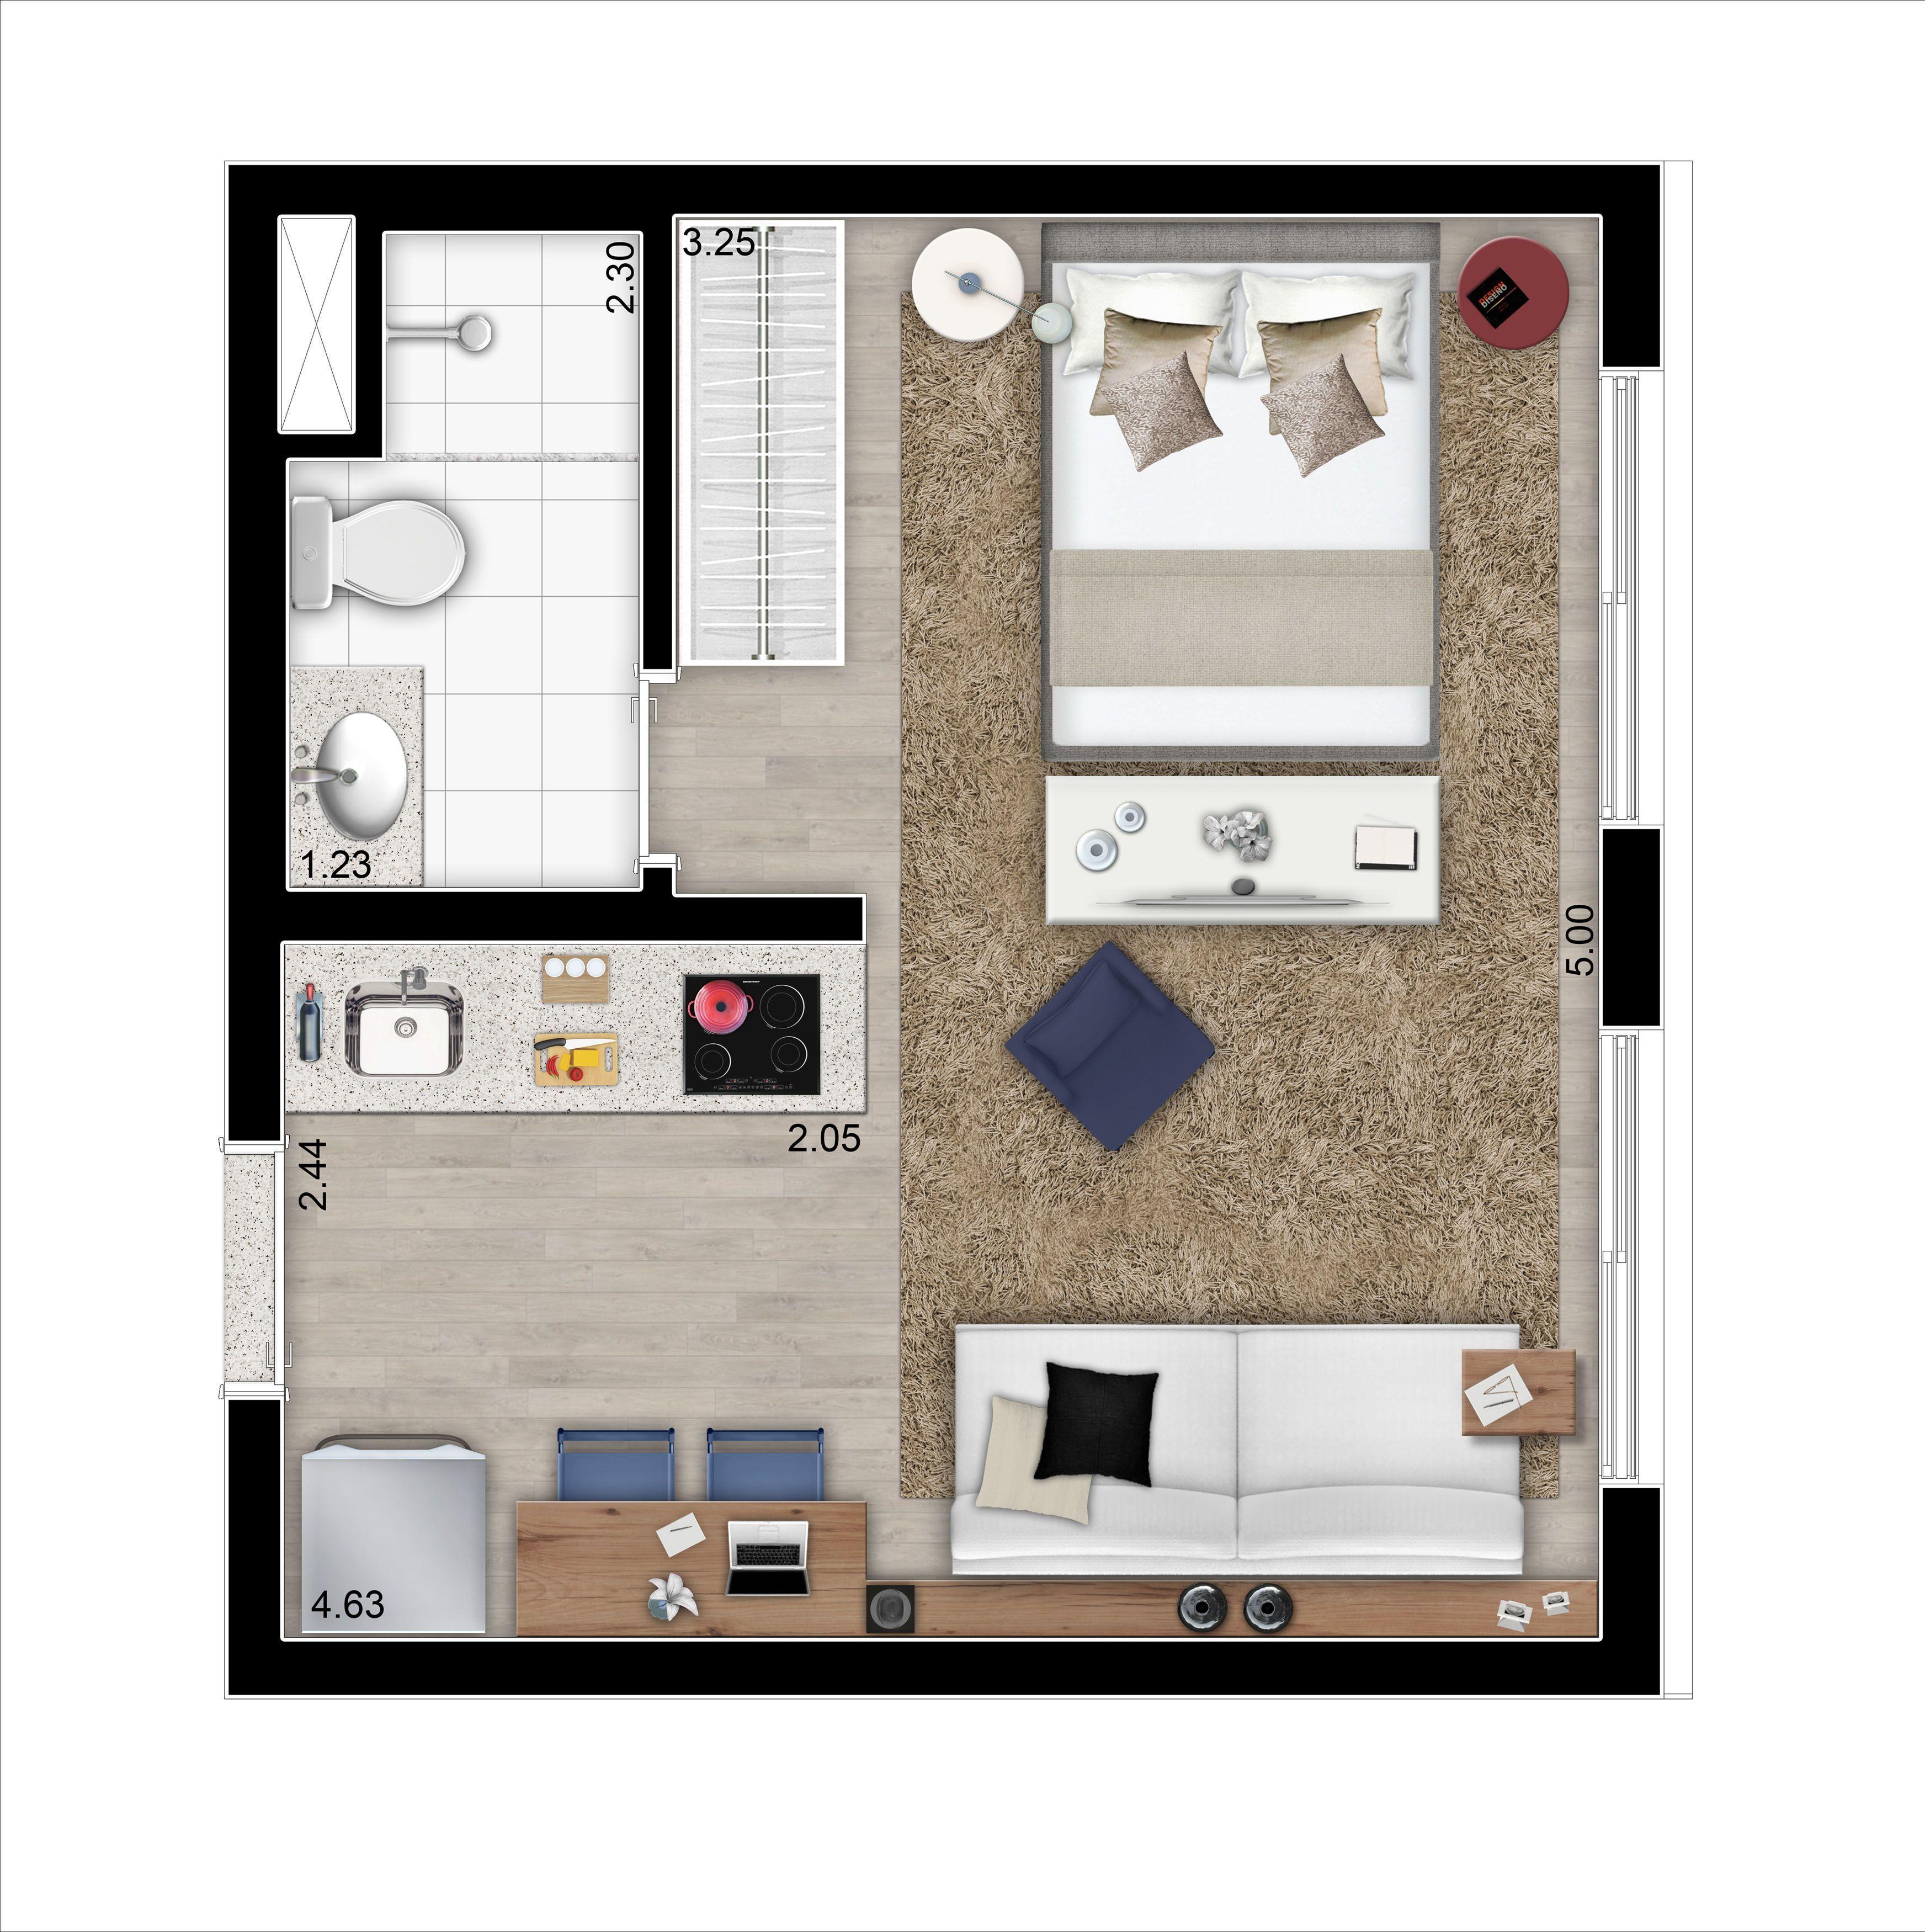 Brilliant Photo Of Apartment Studio Layout Apartment Studio Layout This Would Work Studio Apartment Floor Plans Studio Apartment Layout Studio Apartment Plan